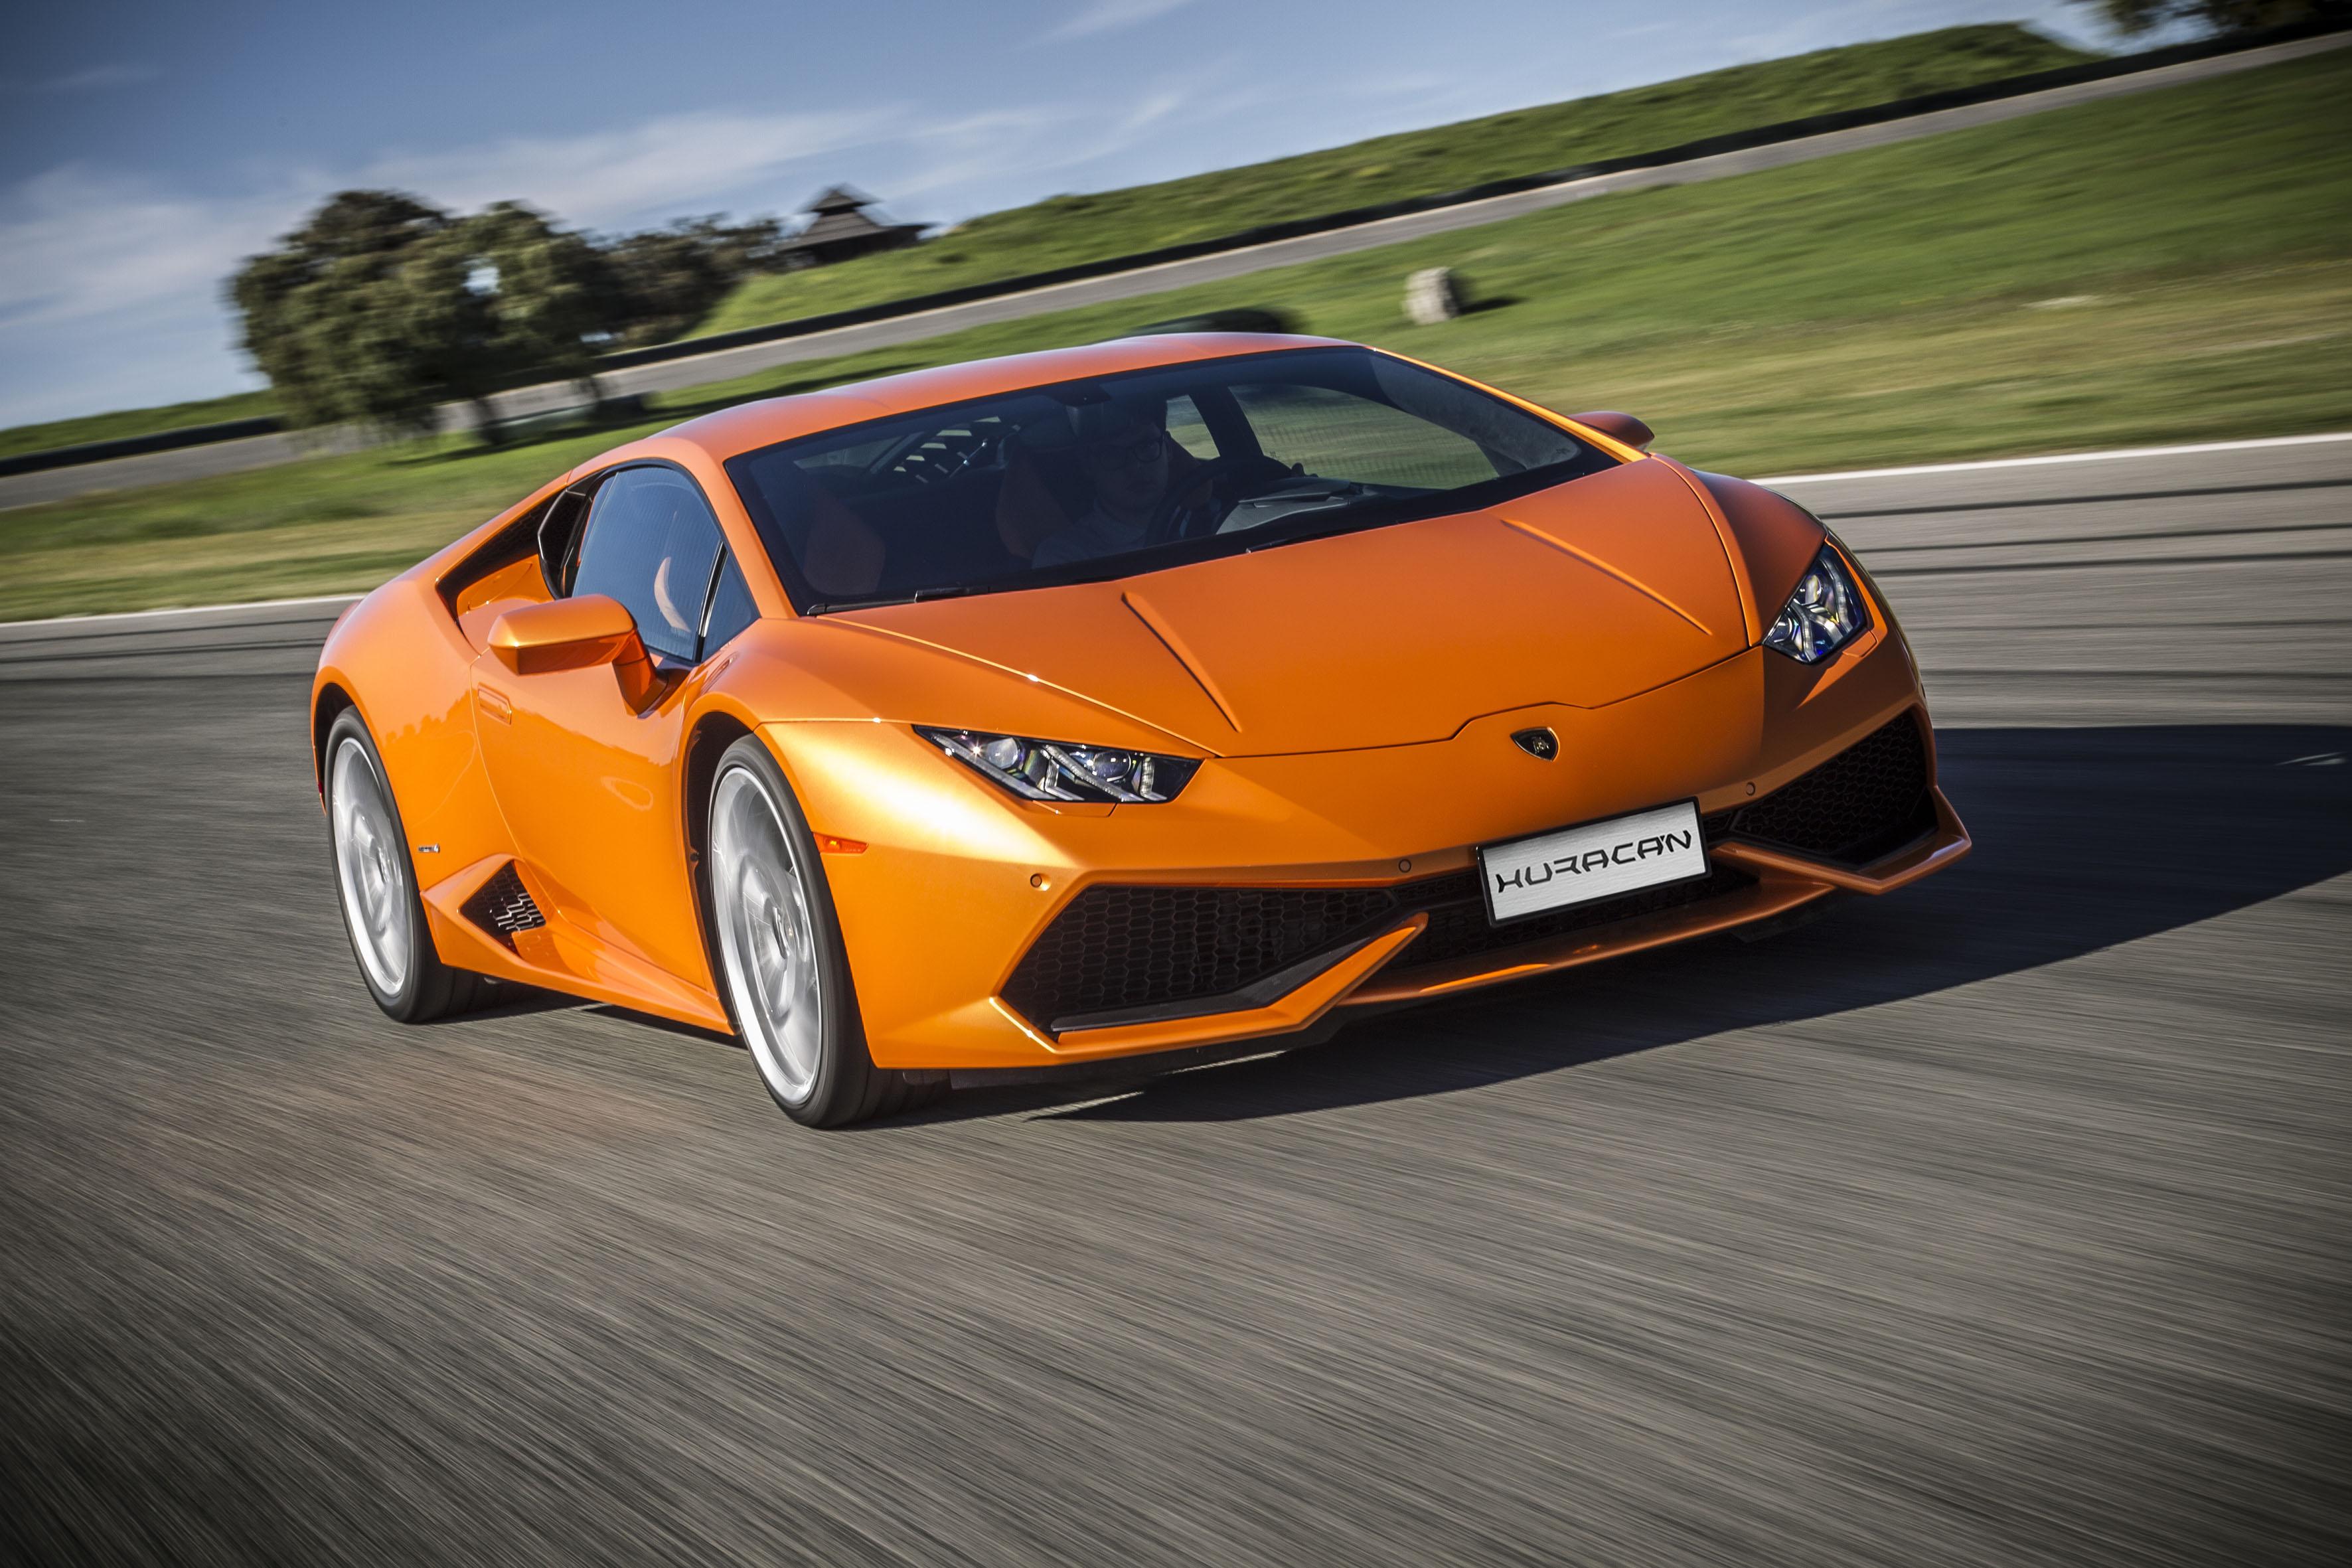 Report: Volkswagen mulls sale of Bentley, Lamborghini, Bugatti to fund EV investment